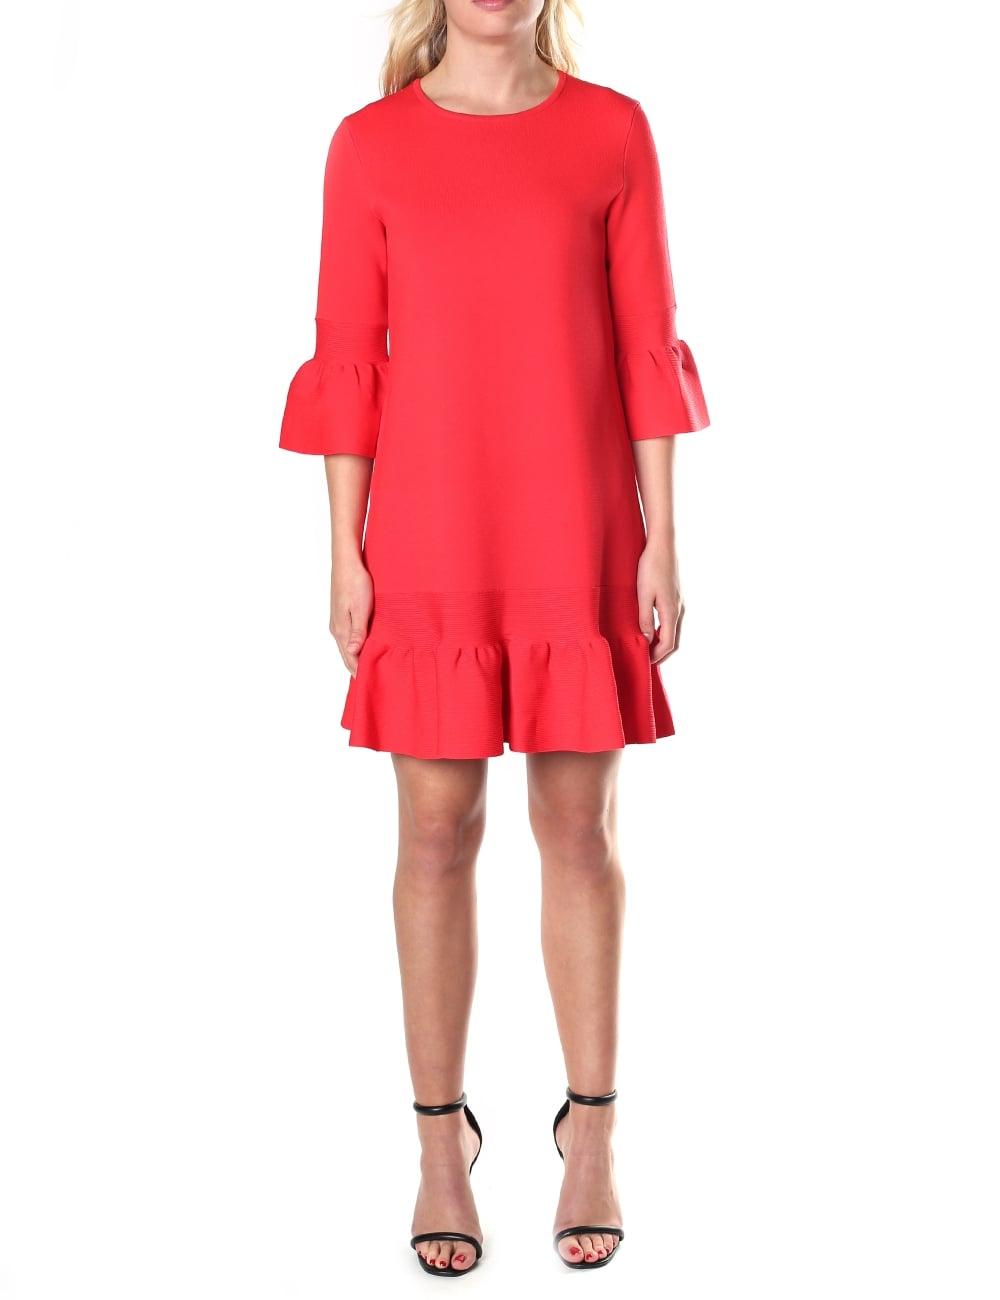 c305ab4b2 Ted Baker Women s Tynia Knitted Rib Detail Dress